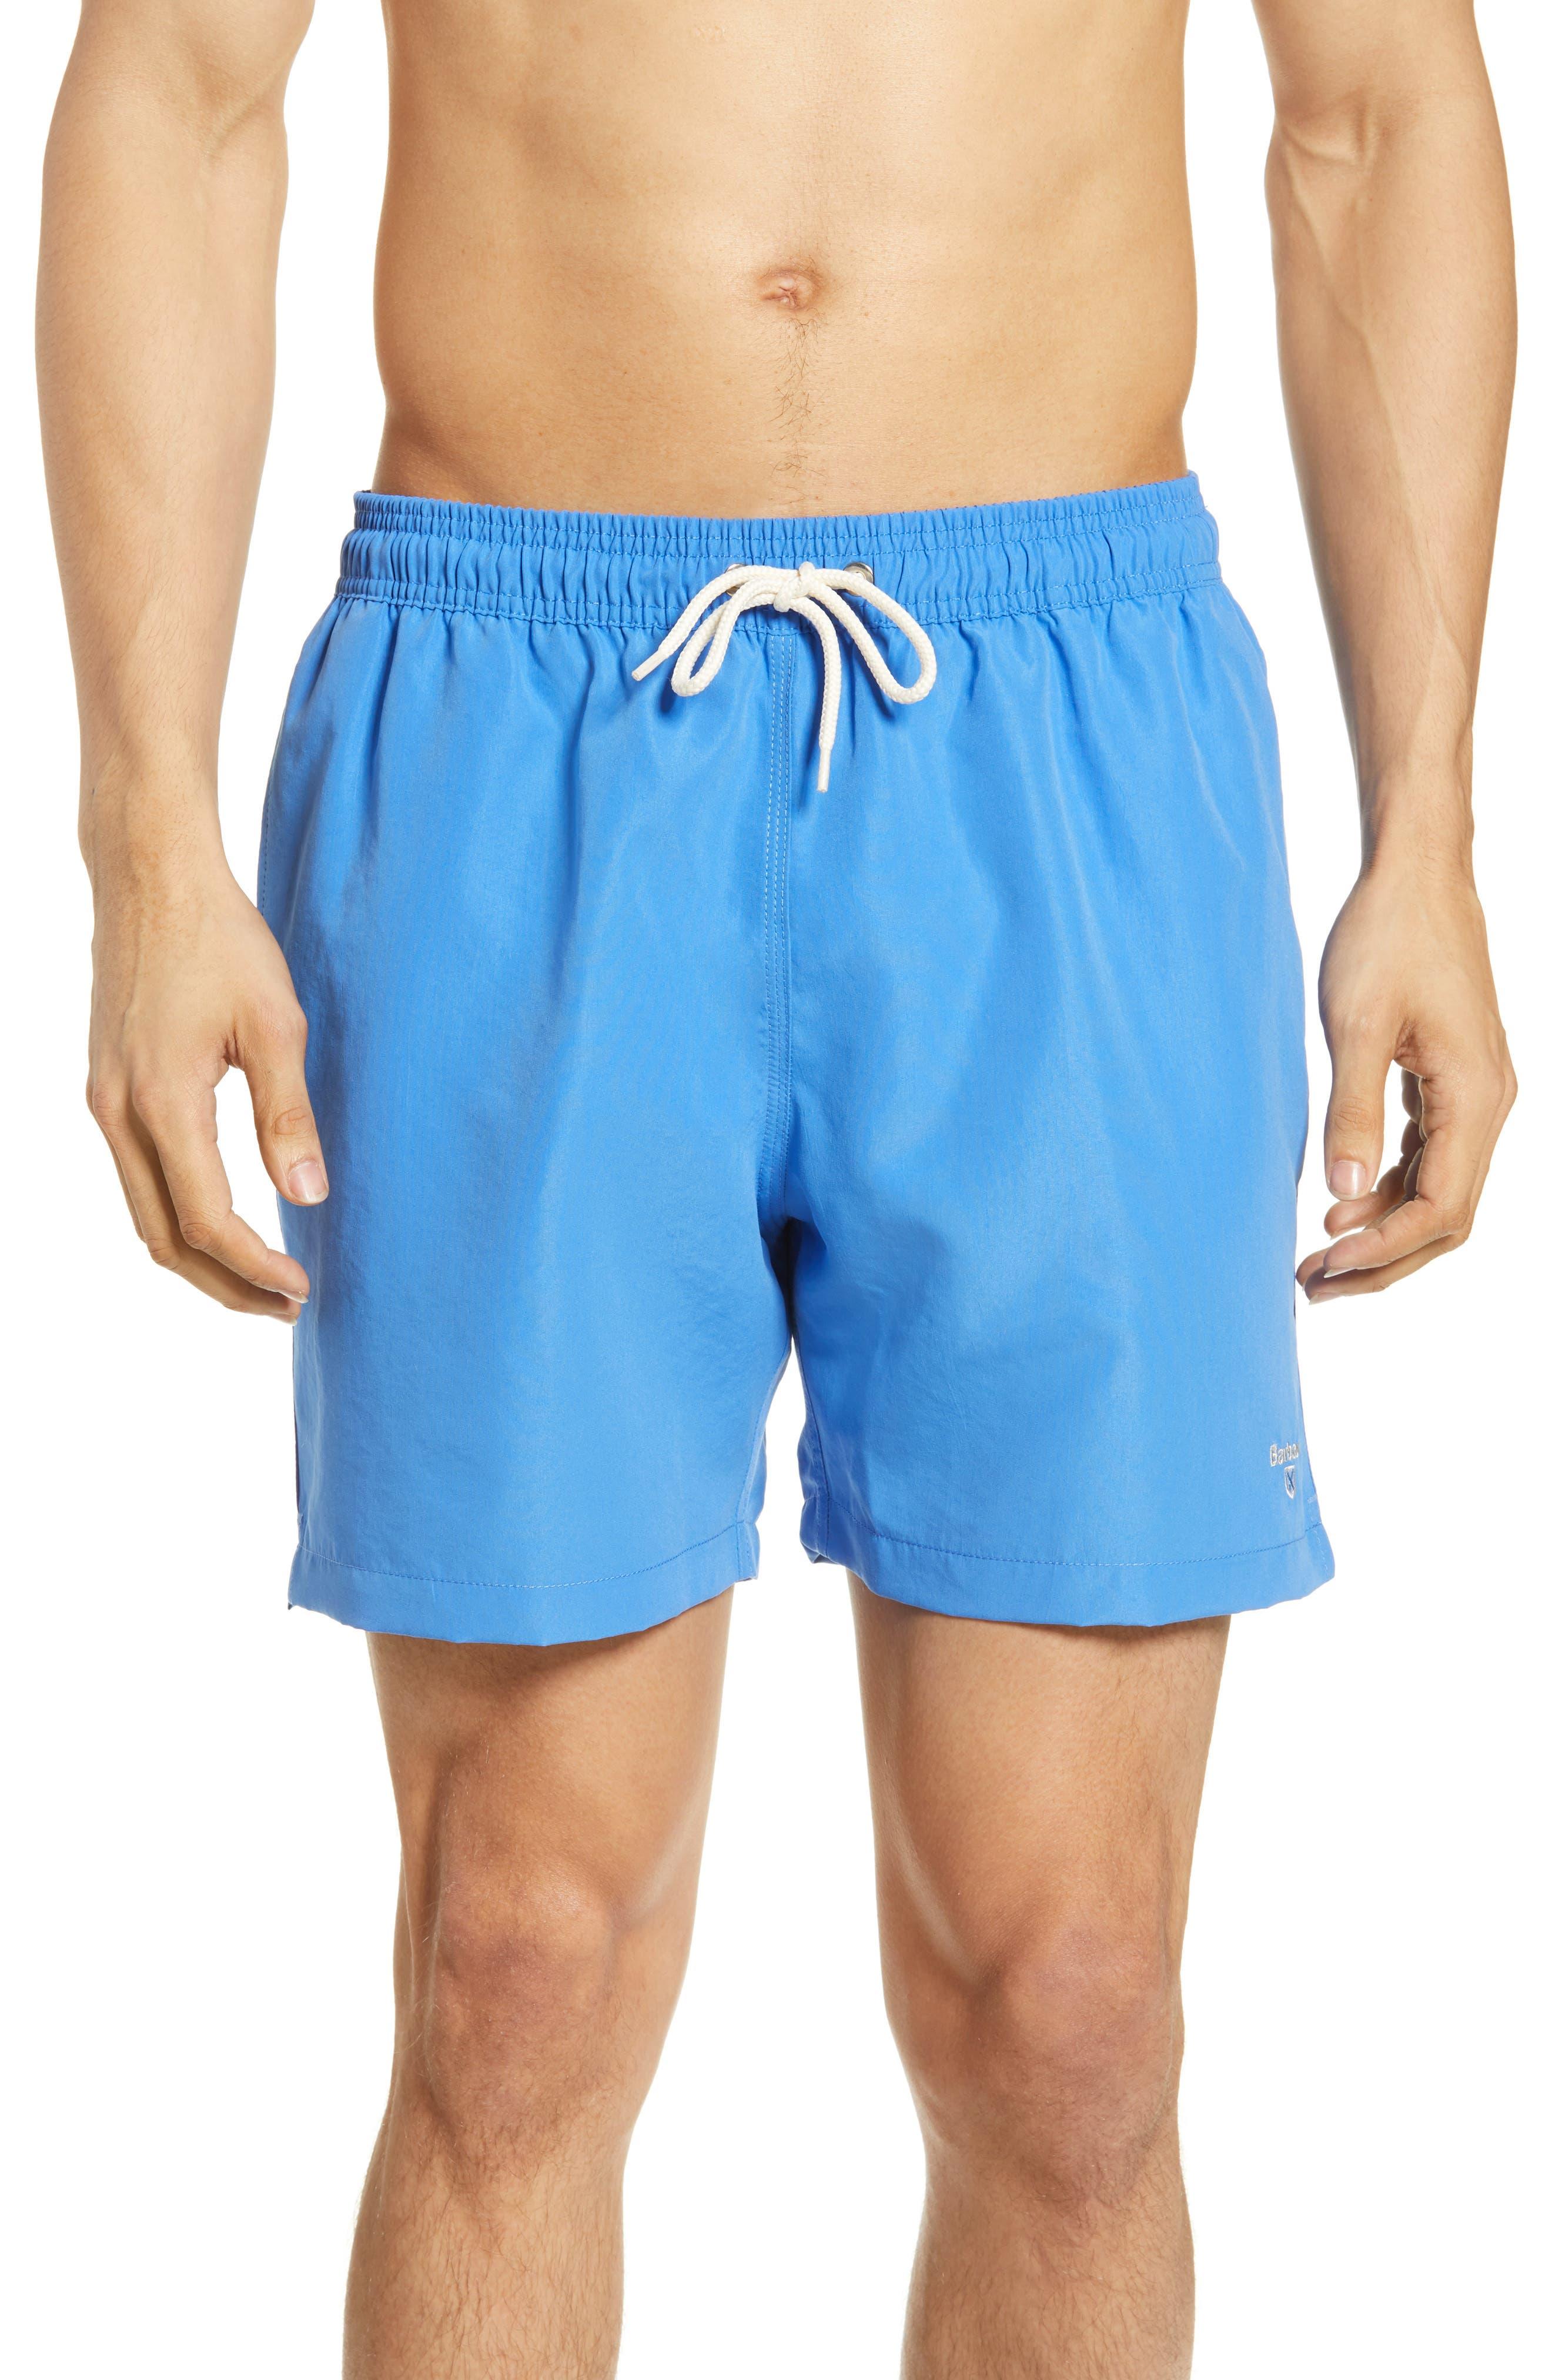 Barbour Logo Swim Trunks, Blue